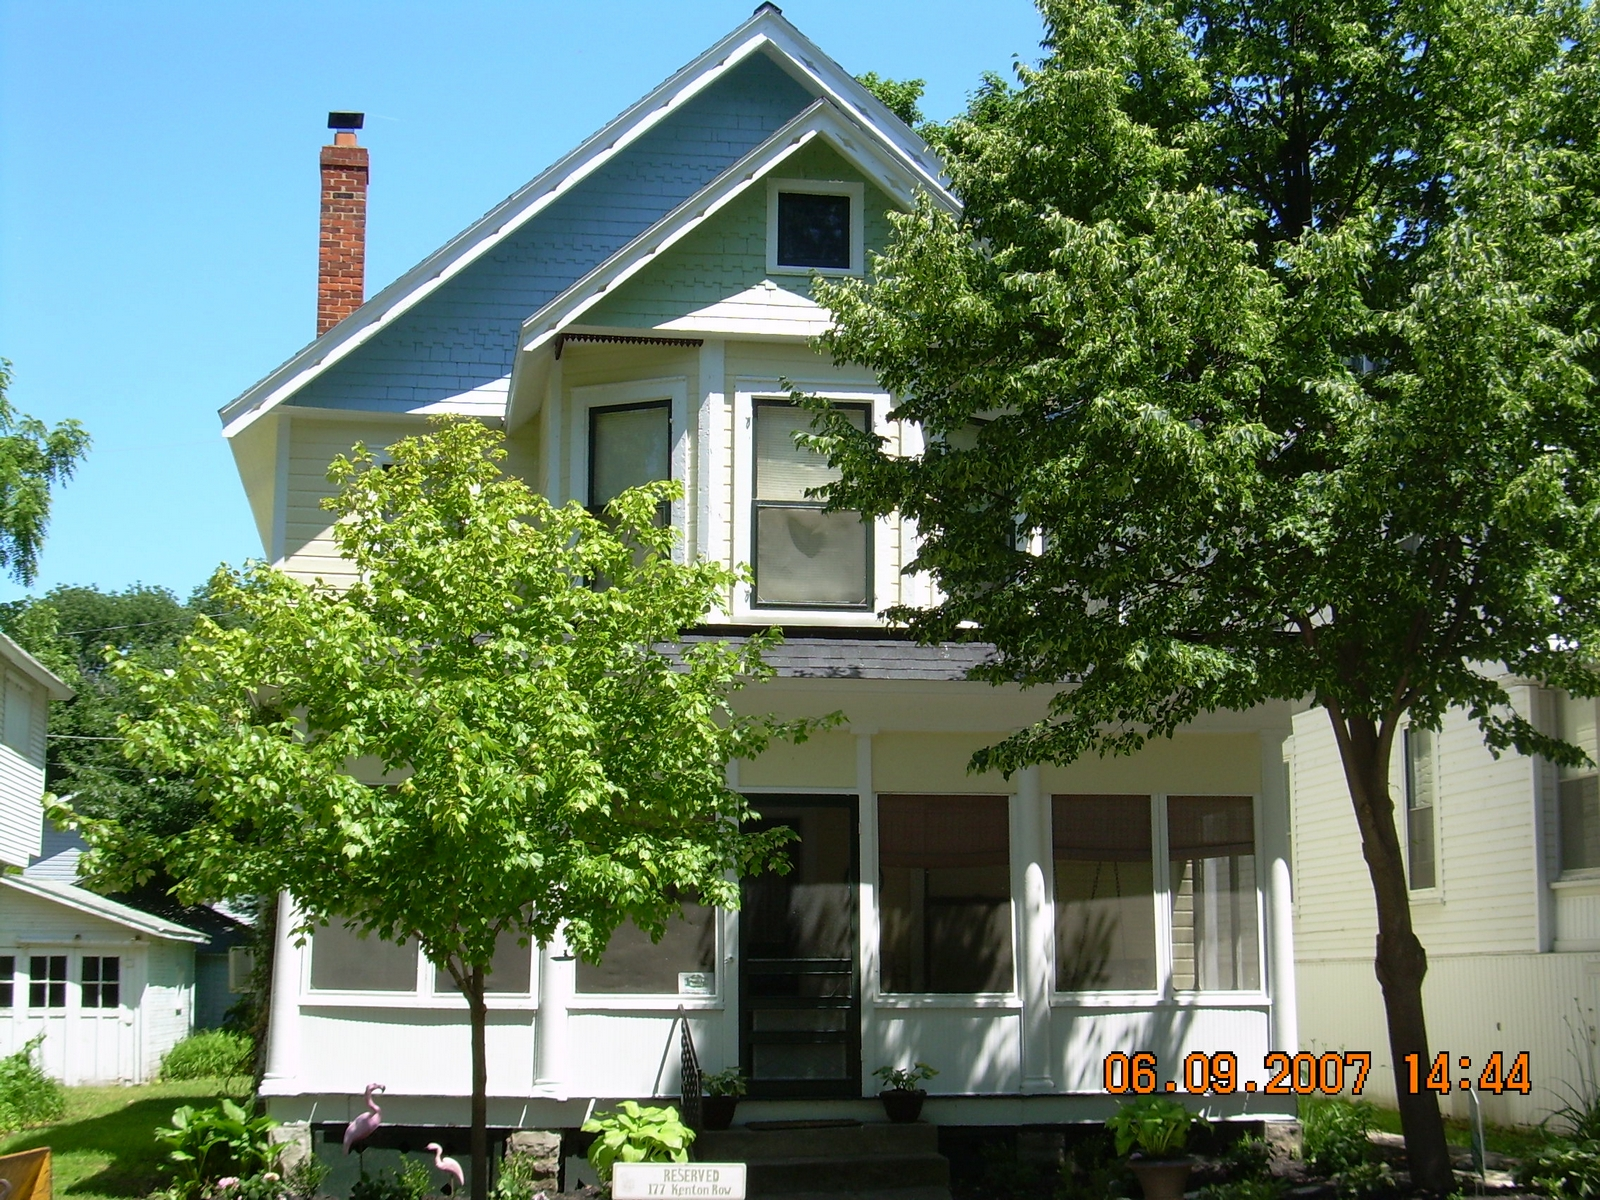 Single Family Home for Sale at 177 Kenton Row Lakeside, Ohio 43440 United States